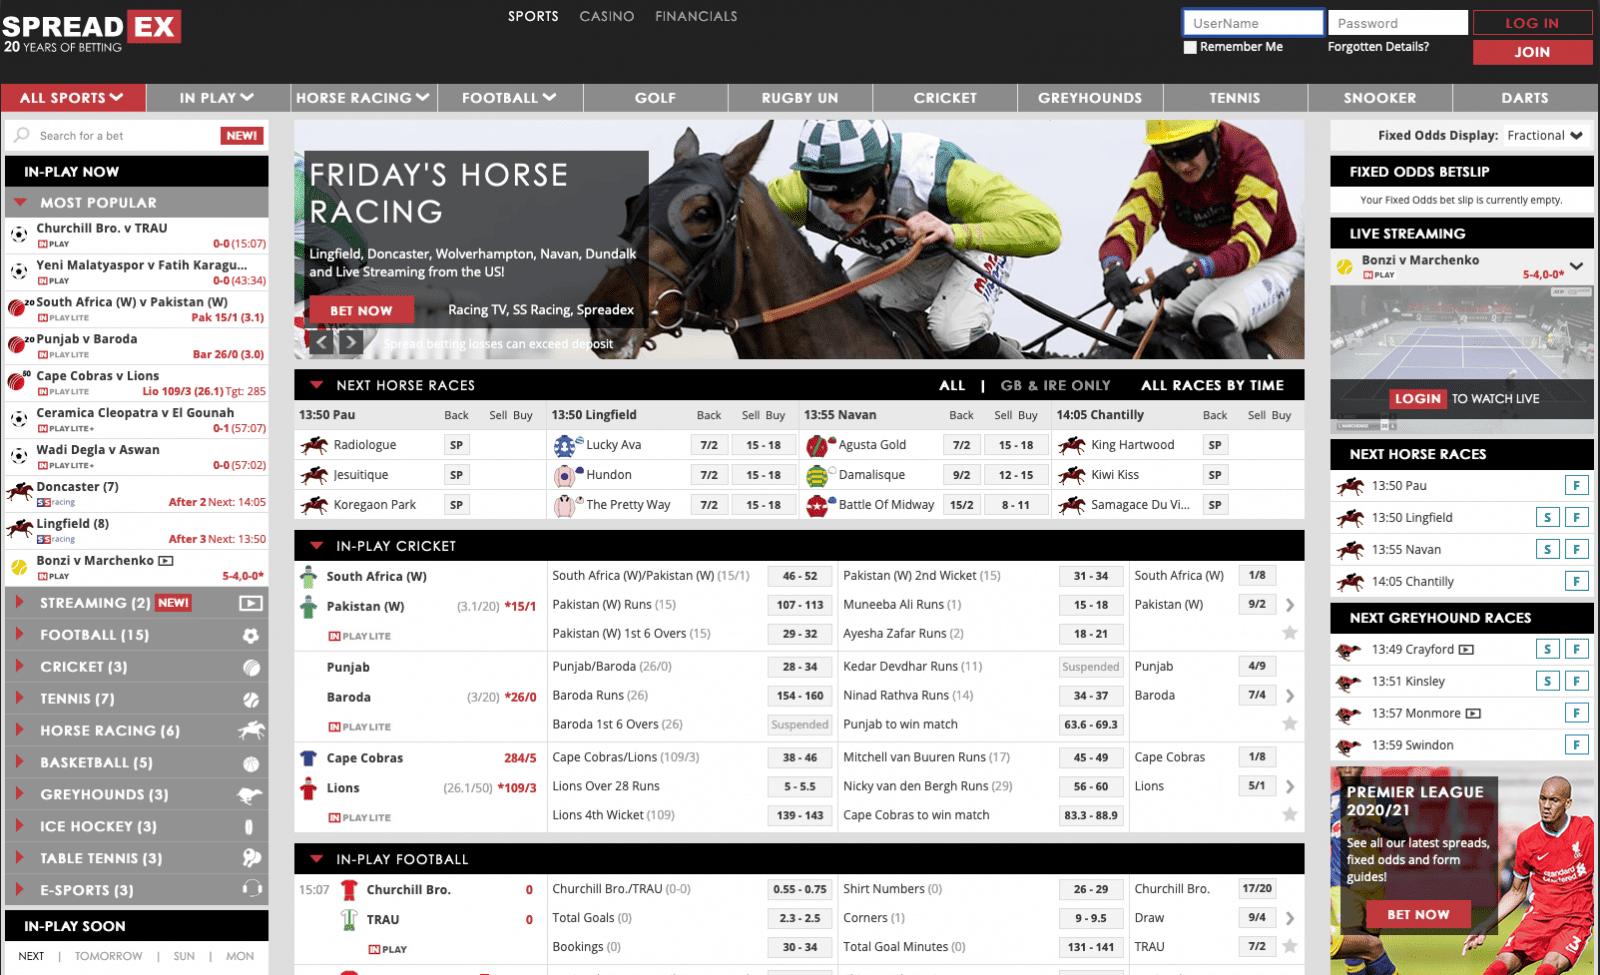 Betting sites - Spreadex